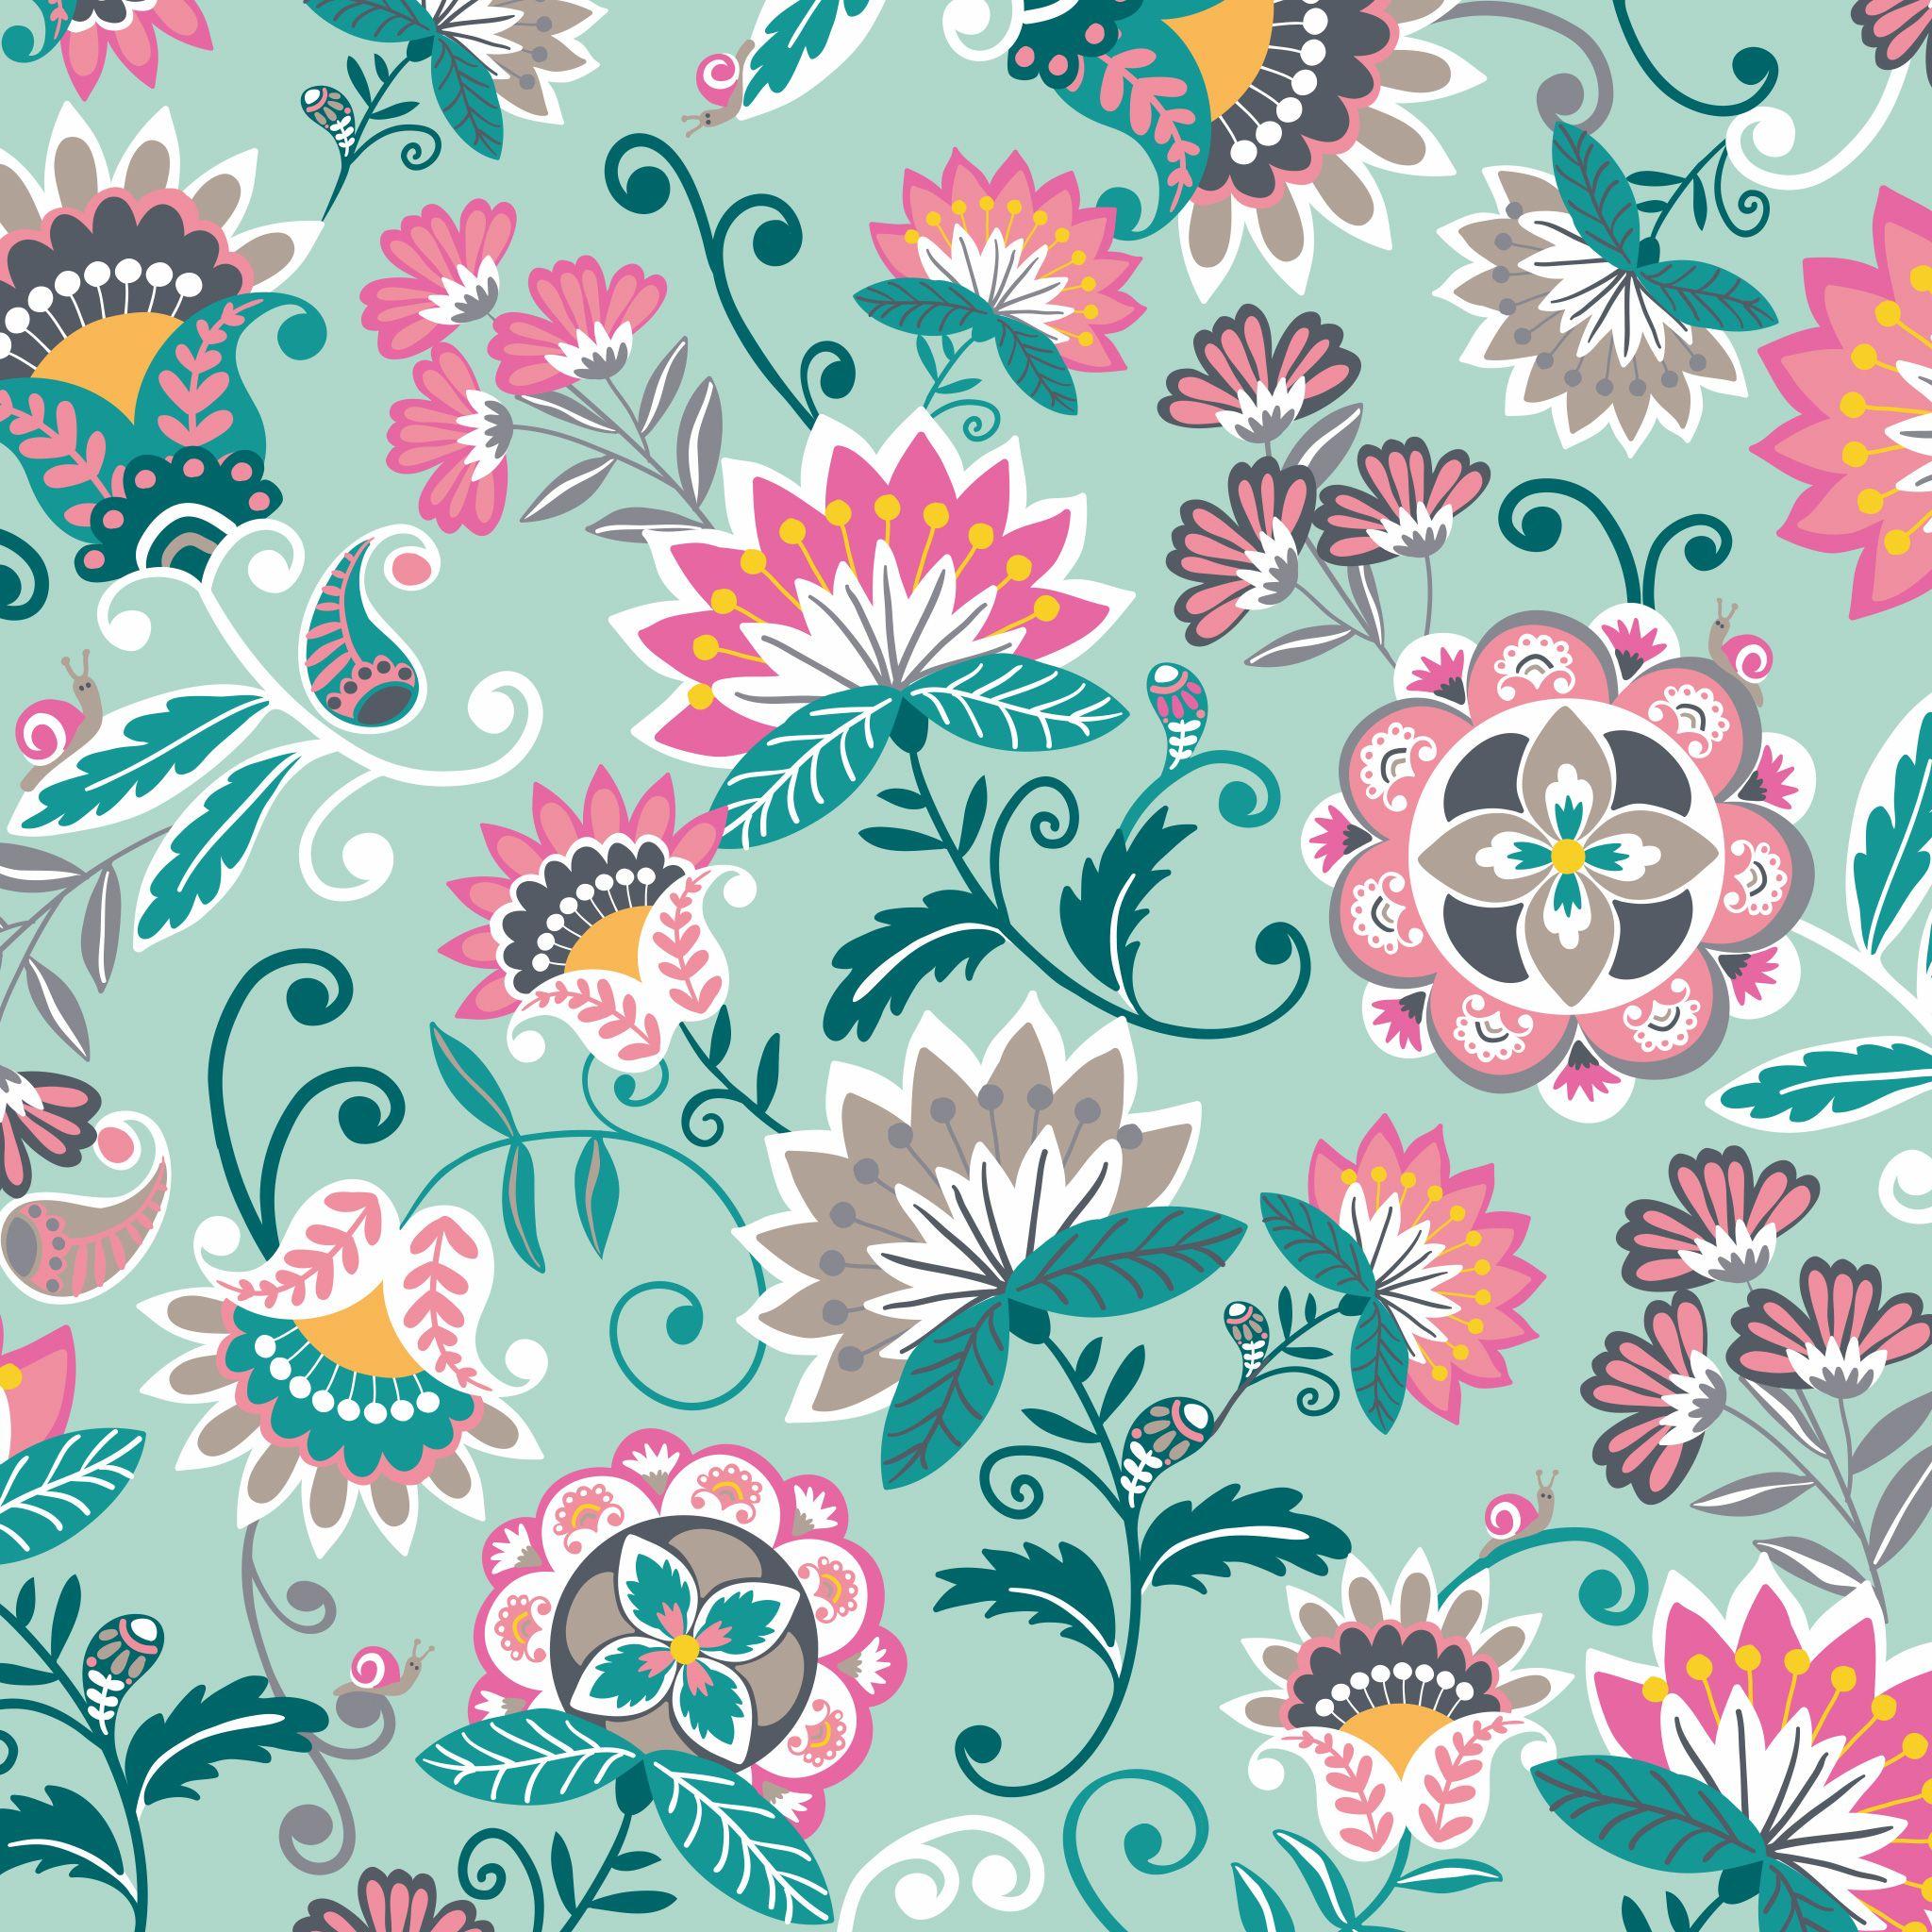 Tablet Wallpaper In Mint Flowers Iphone Wallpaper Vera Bradley